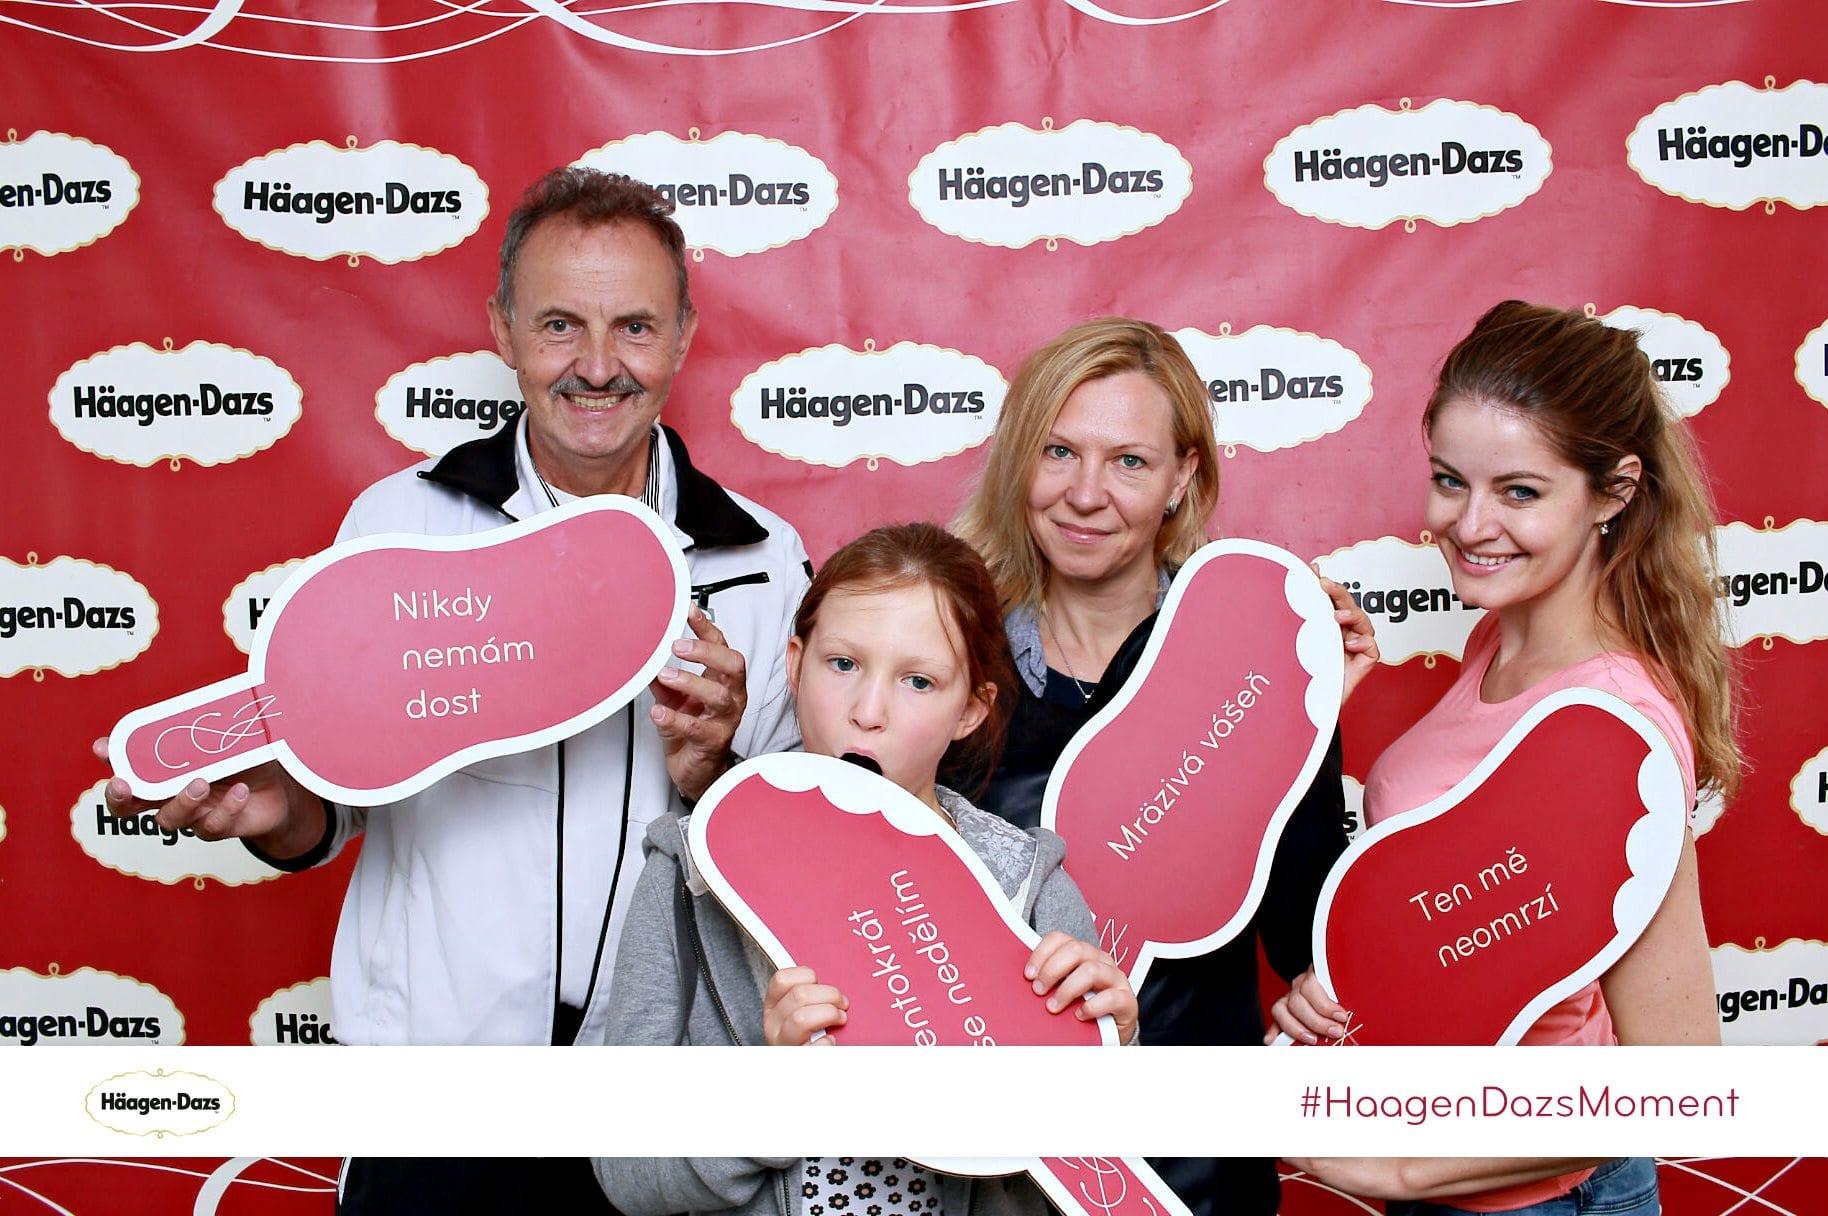 fotokoutek-haagen-dazs-3-9-2017-304034